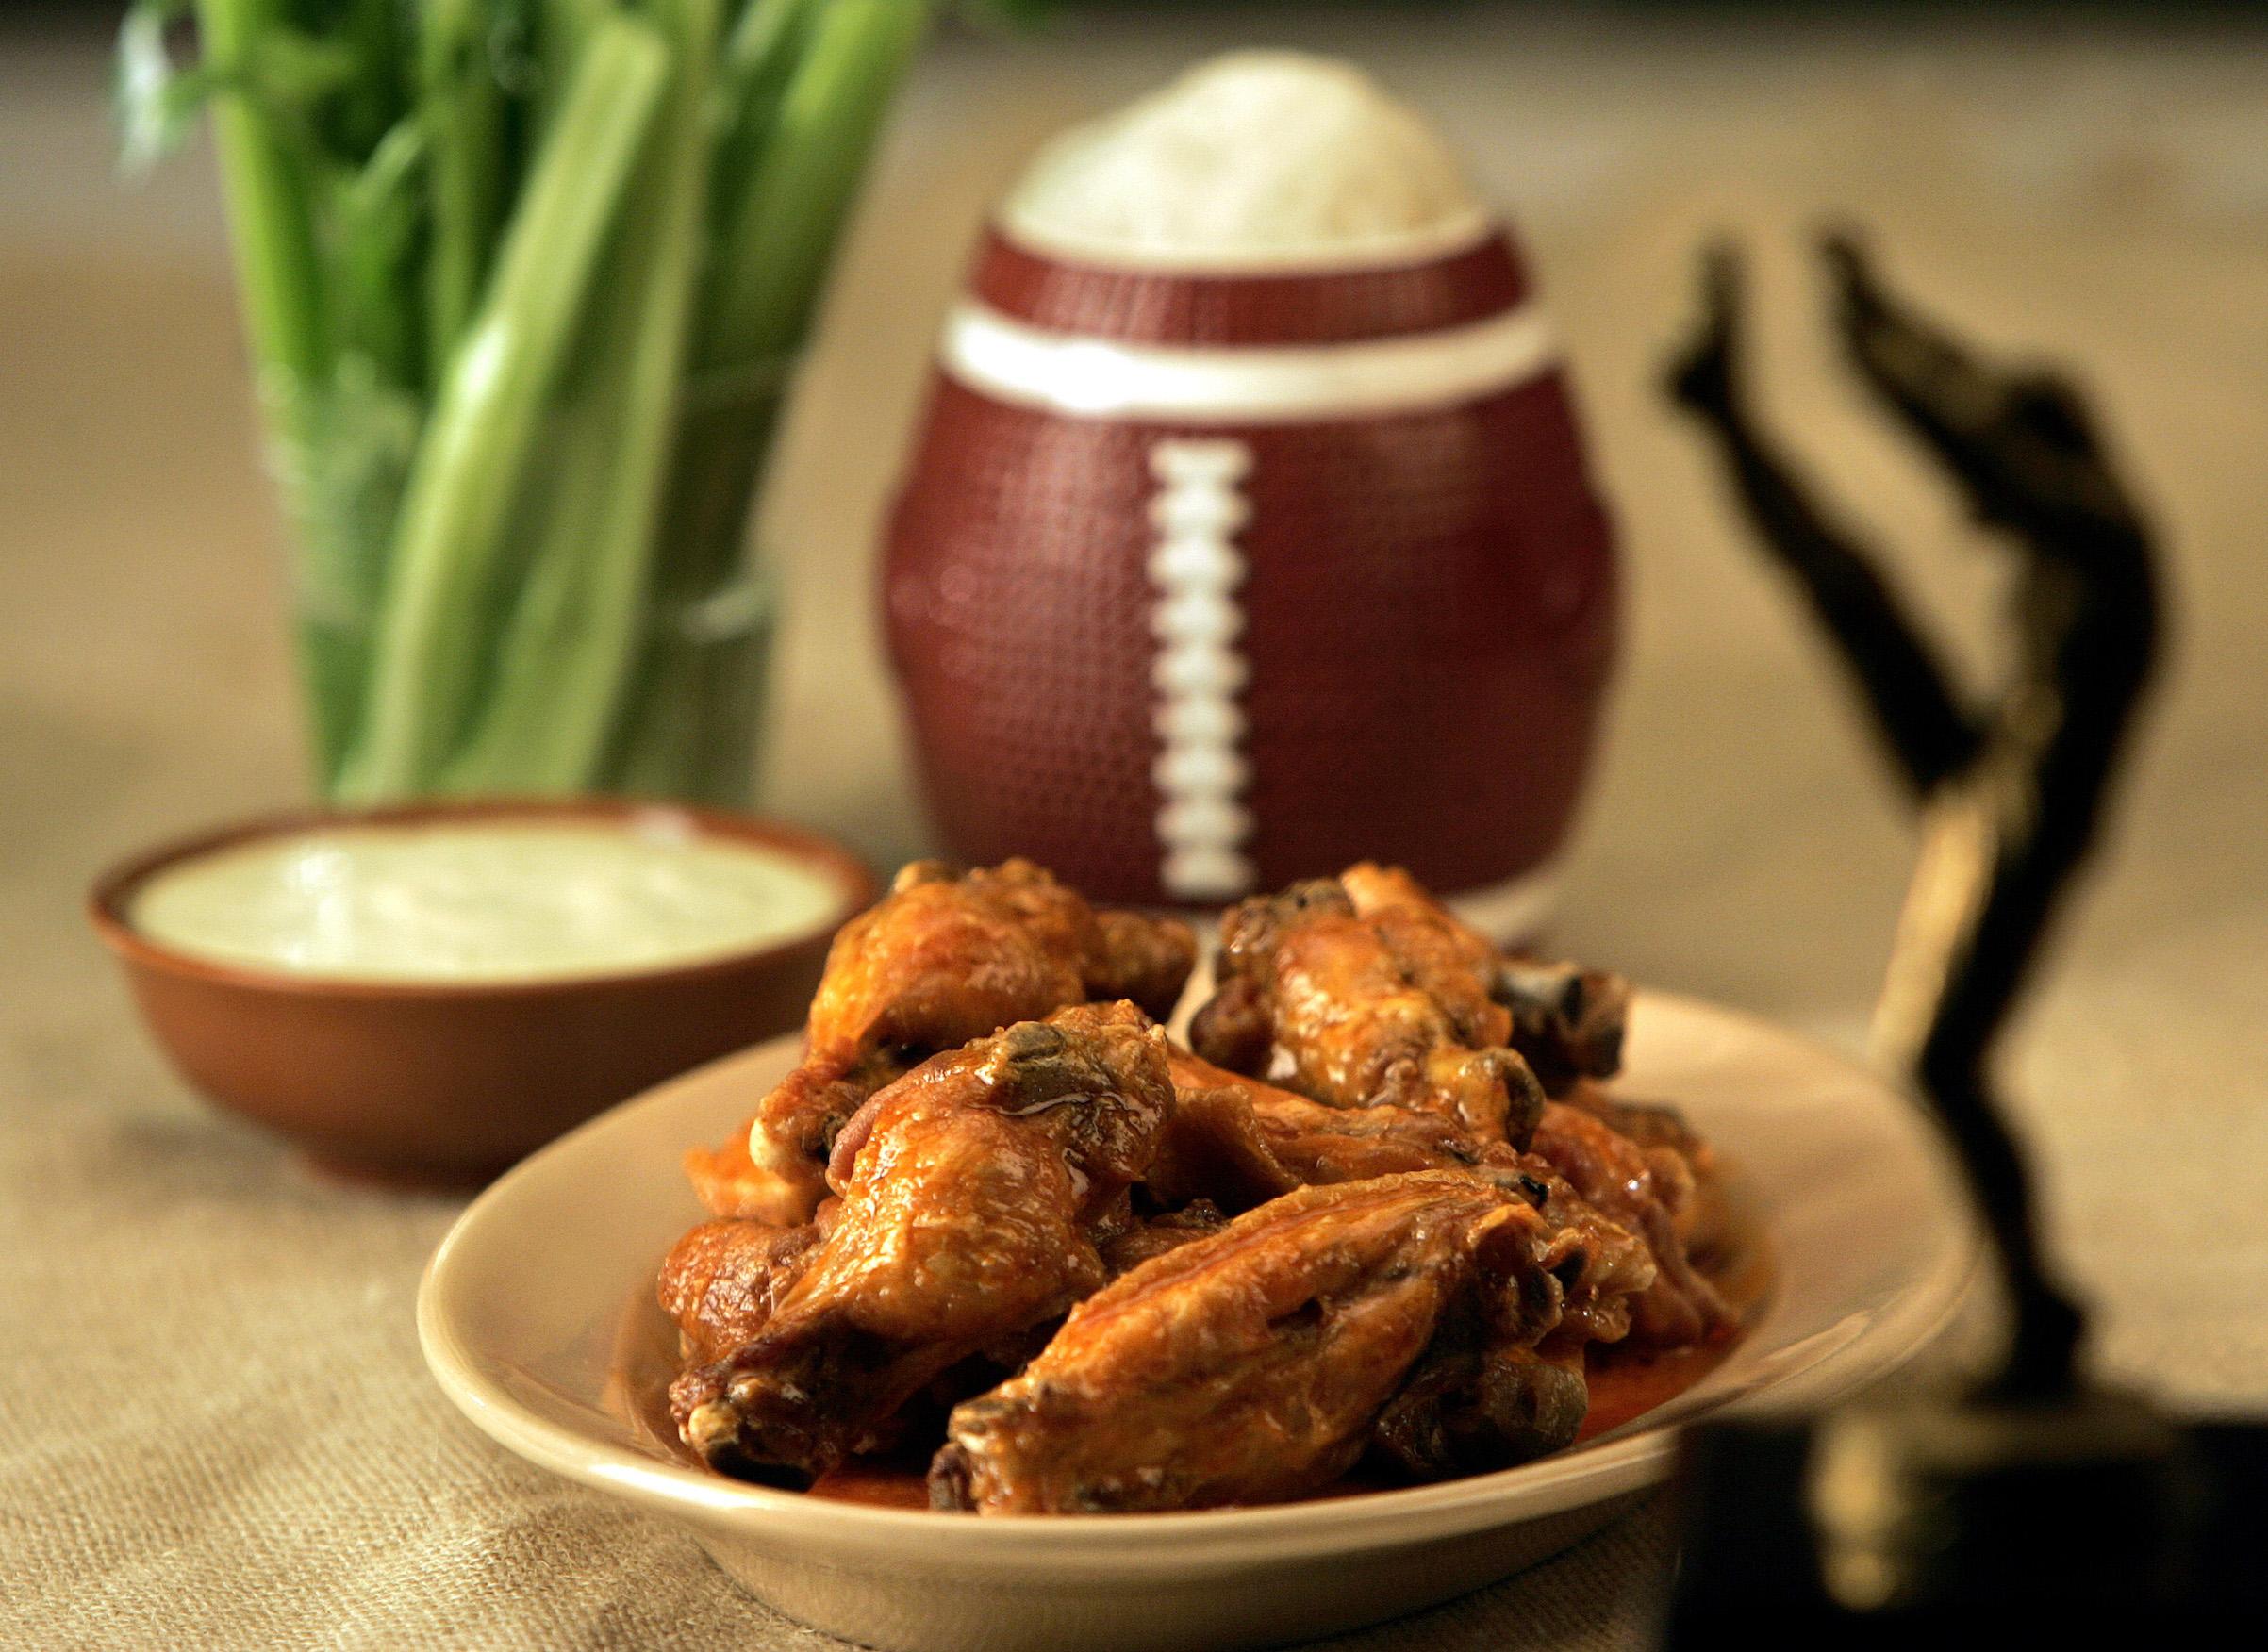 A bowl of Buffalo chicken wings